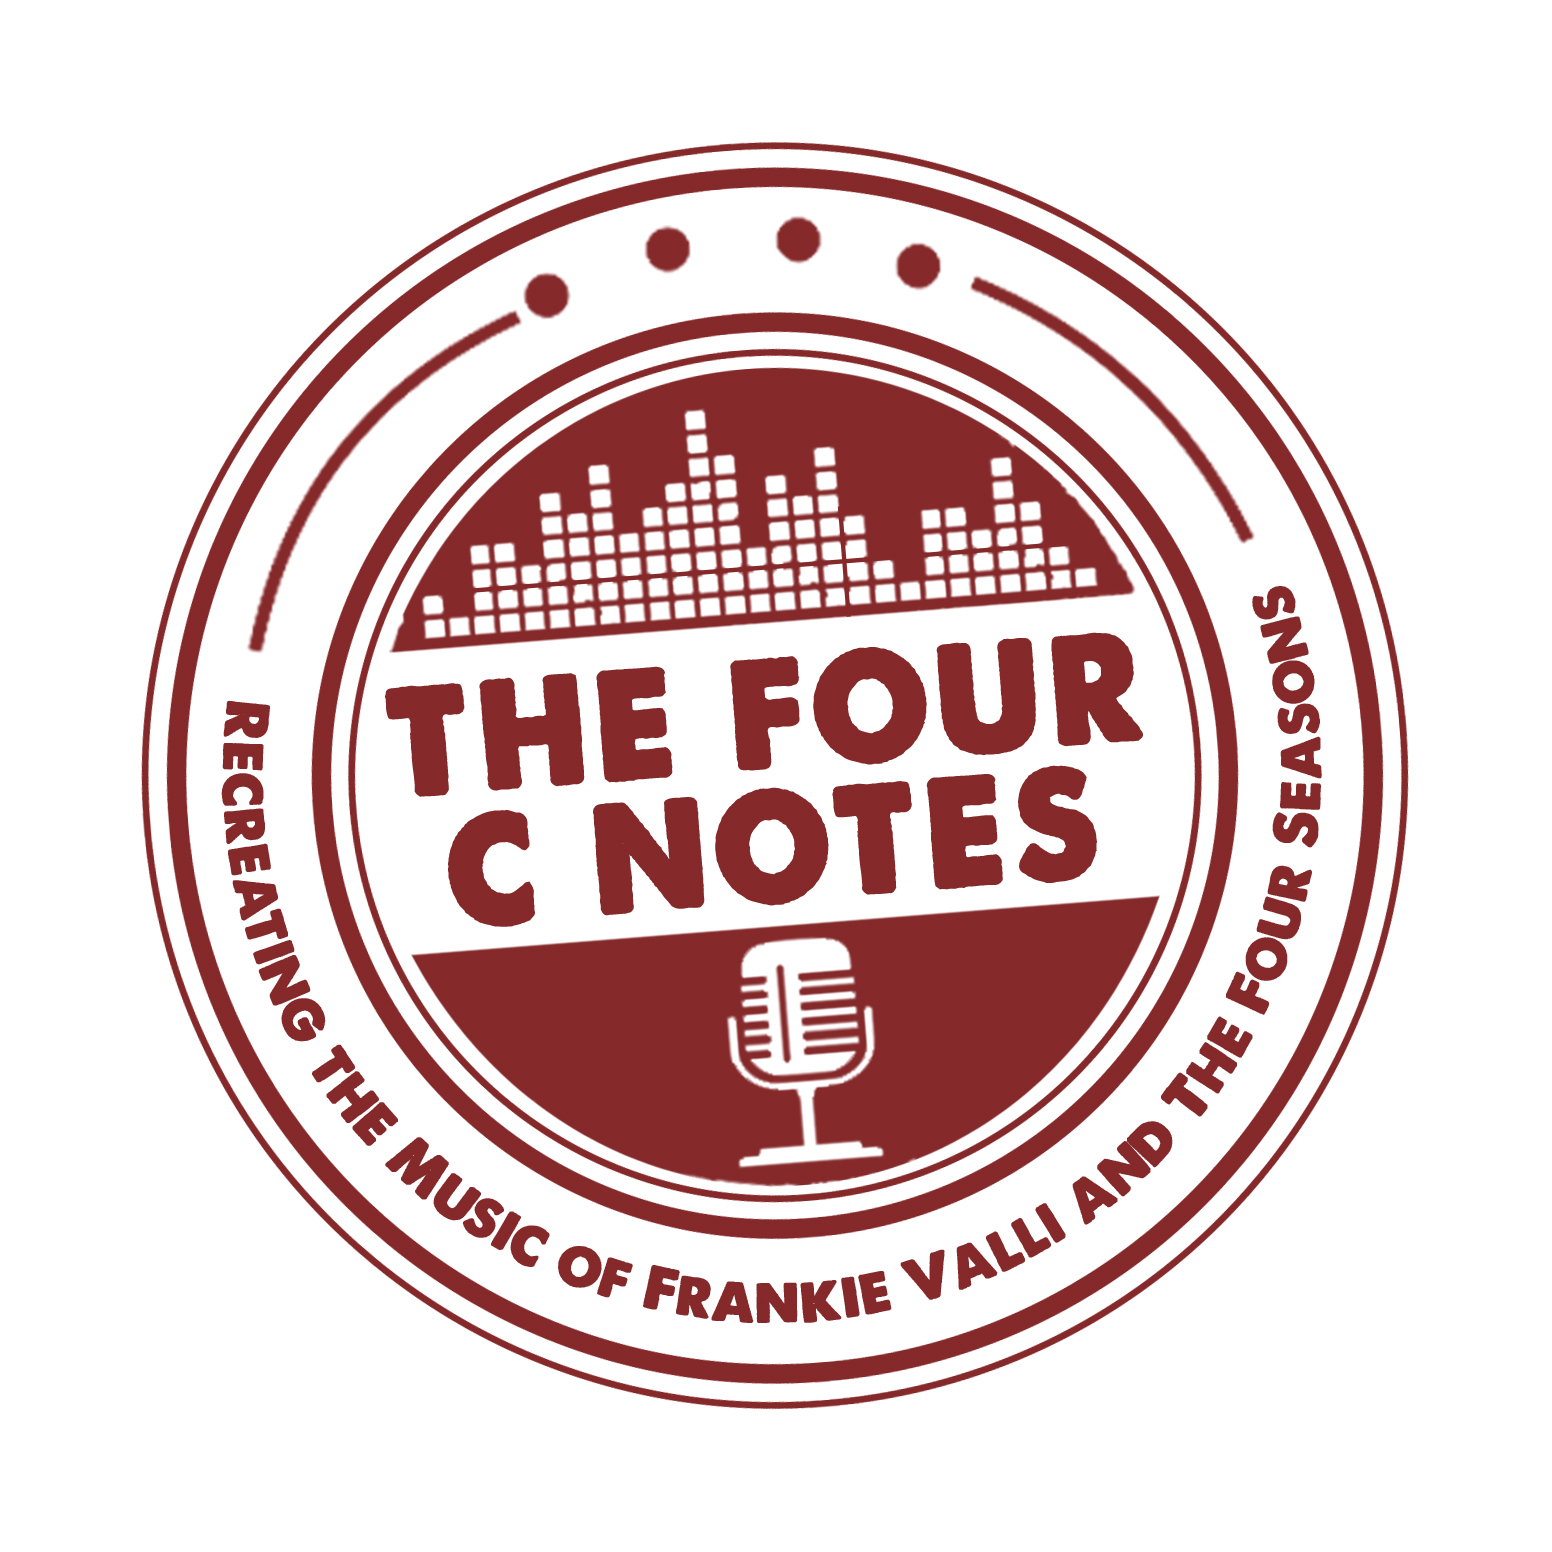 The Four C Notes logo